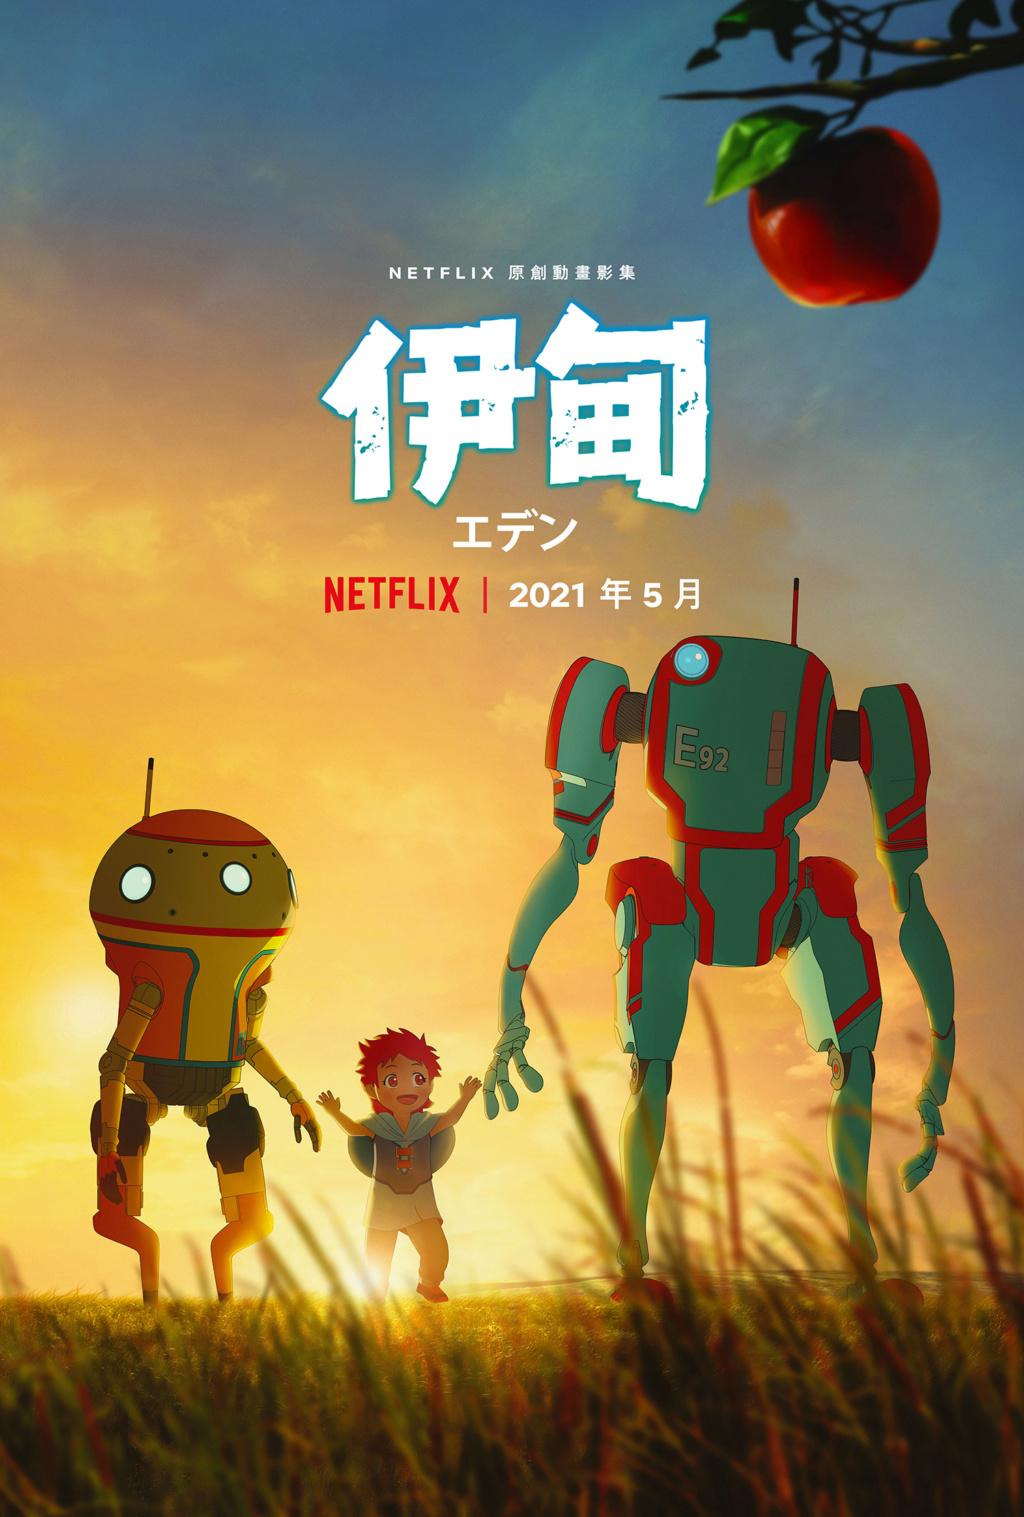 Netflix原創動畫再添一筆!台日美合作《伊甸》揭動人親情! Eden_v10